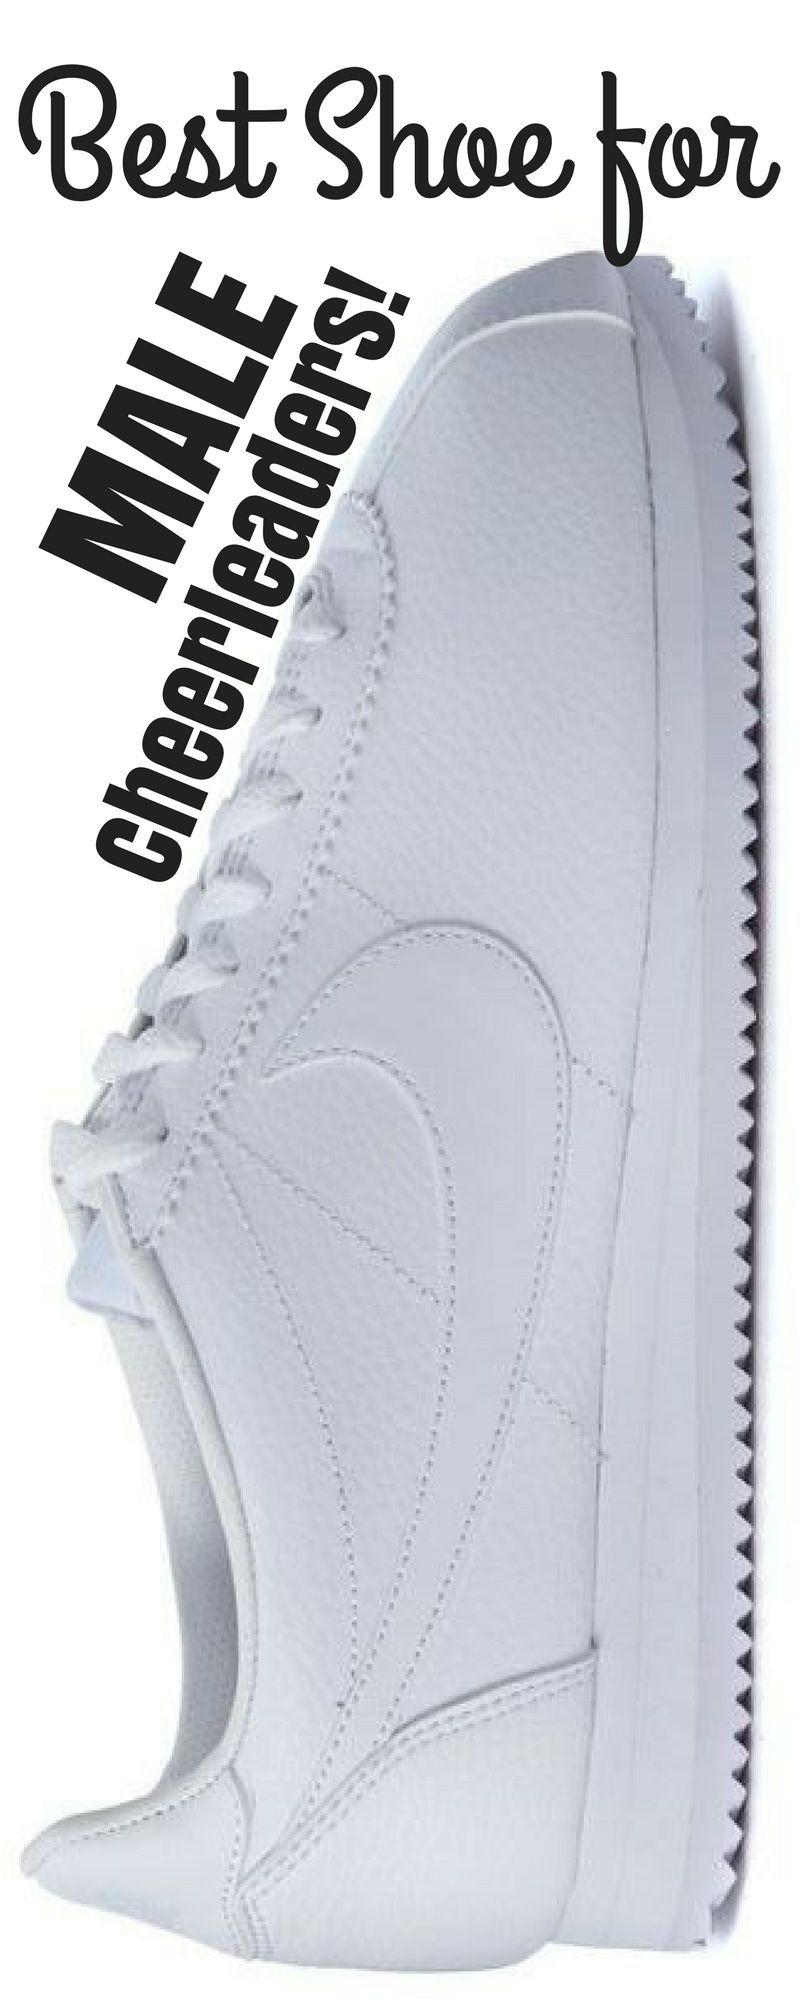 Nike Cortez. Male cheerleading shoe. Co